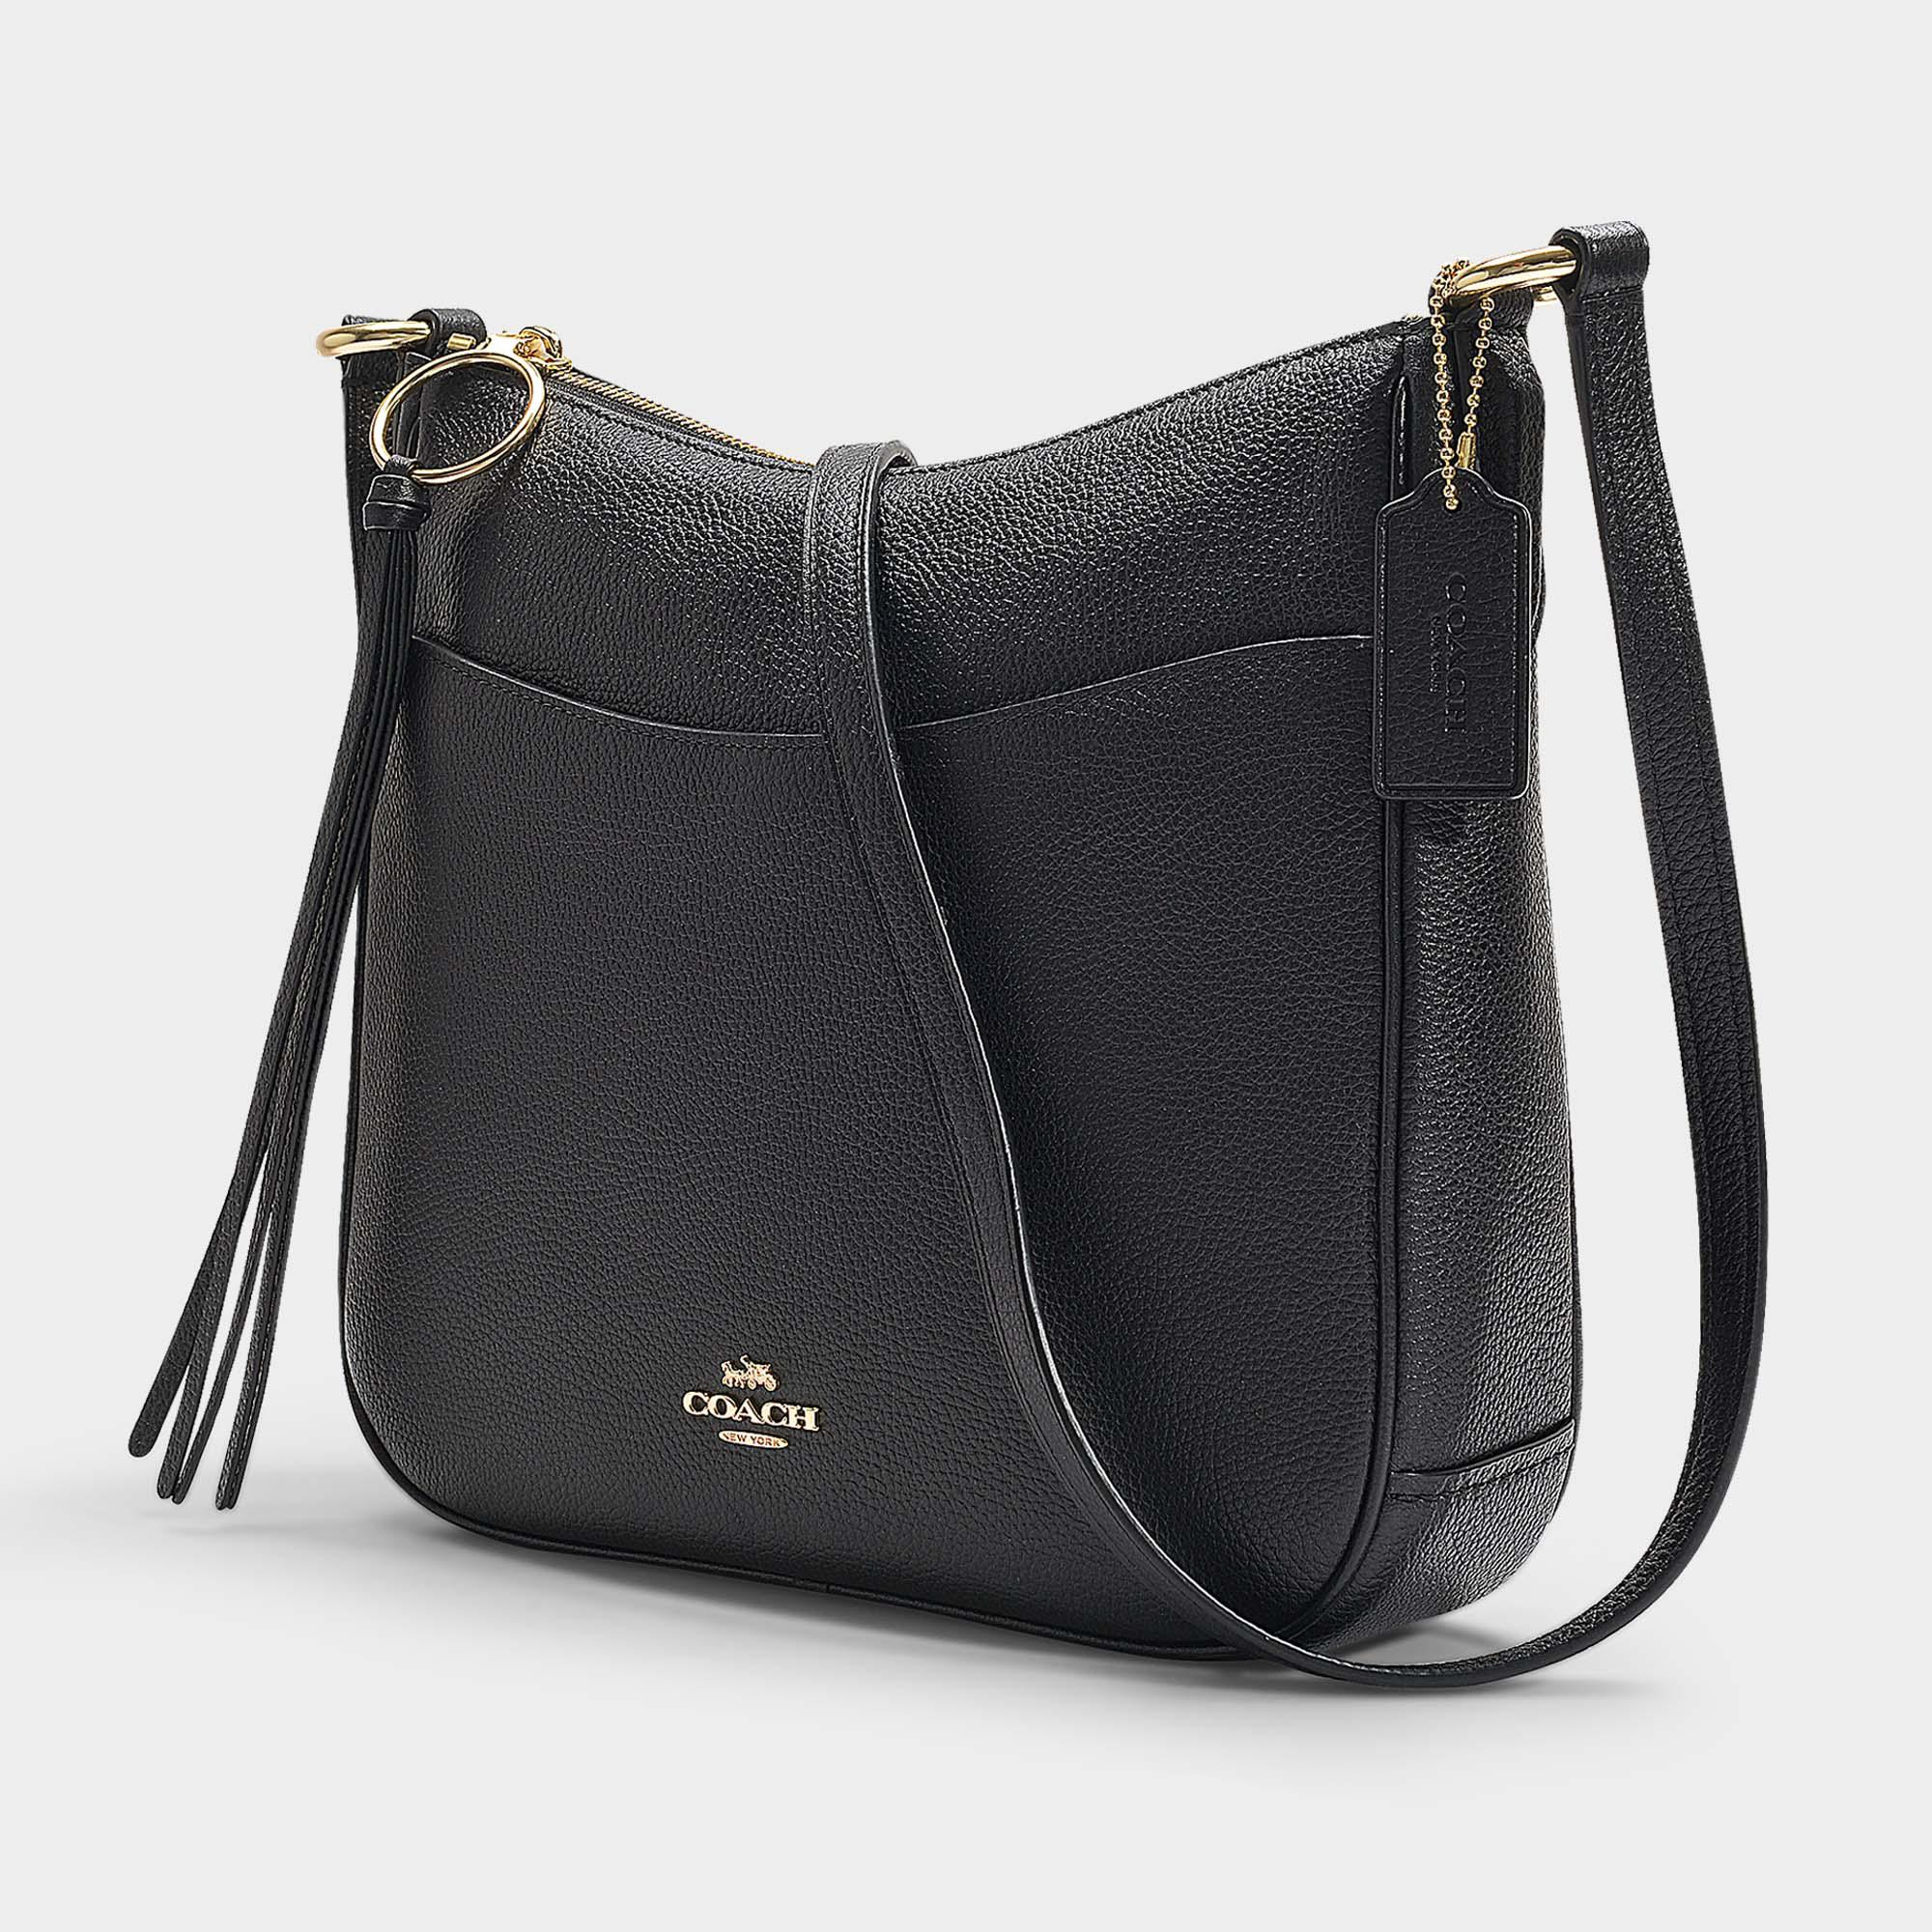 7ebae996cc9d73 ... usa coach black polished pebble leather chaise crossbody lyst. view  fullscreen a6d64 3fec1